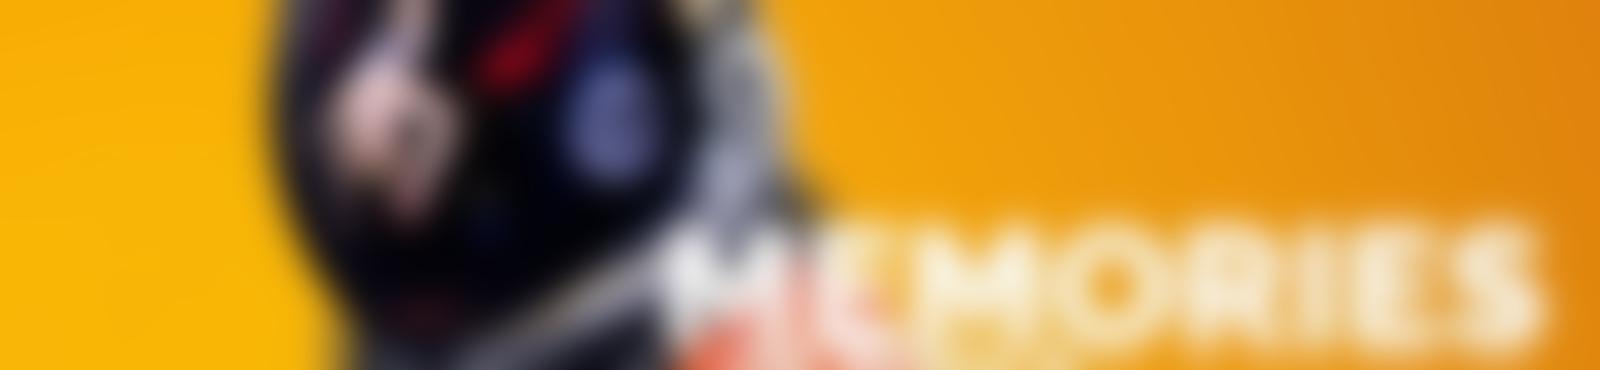 Blurred 980728c5 7802 4d19 9762 6ad99e0cfb90